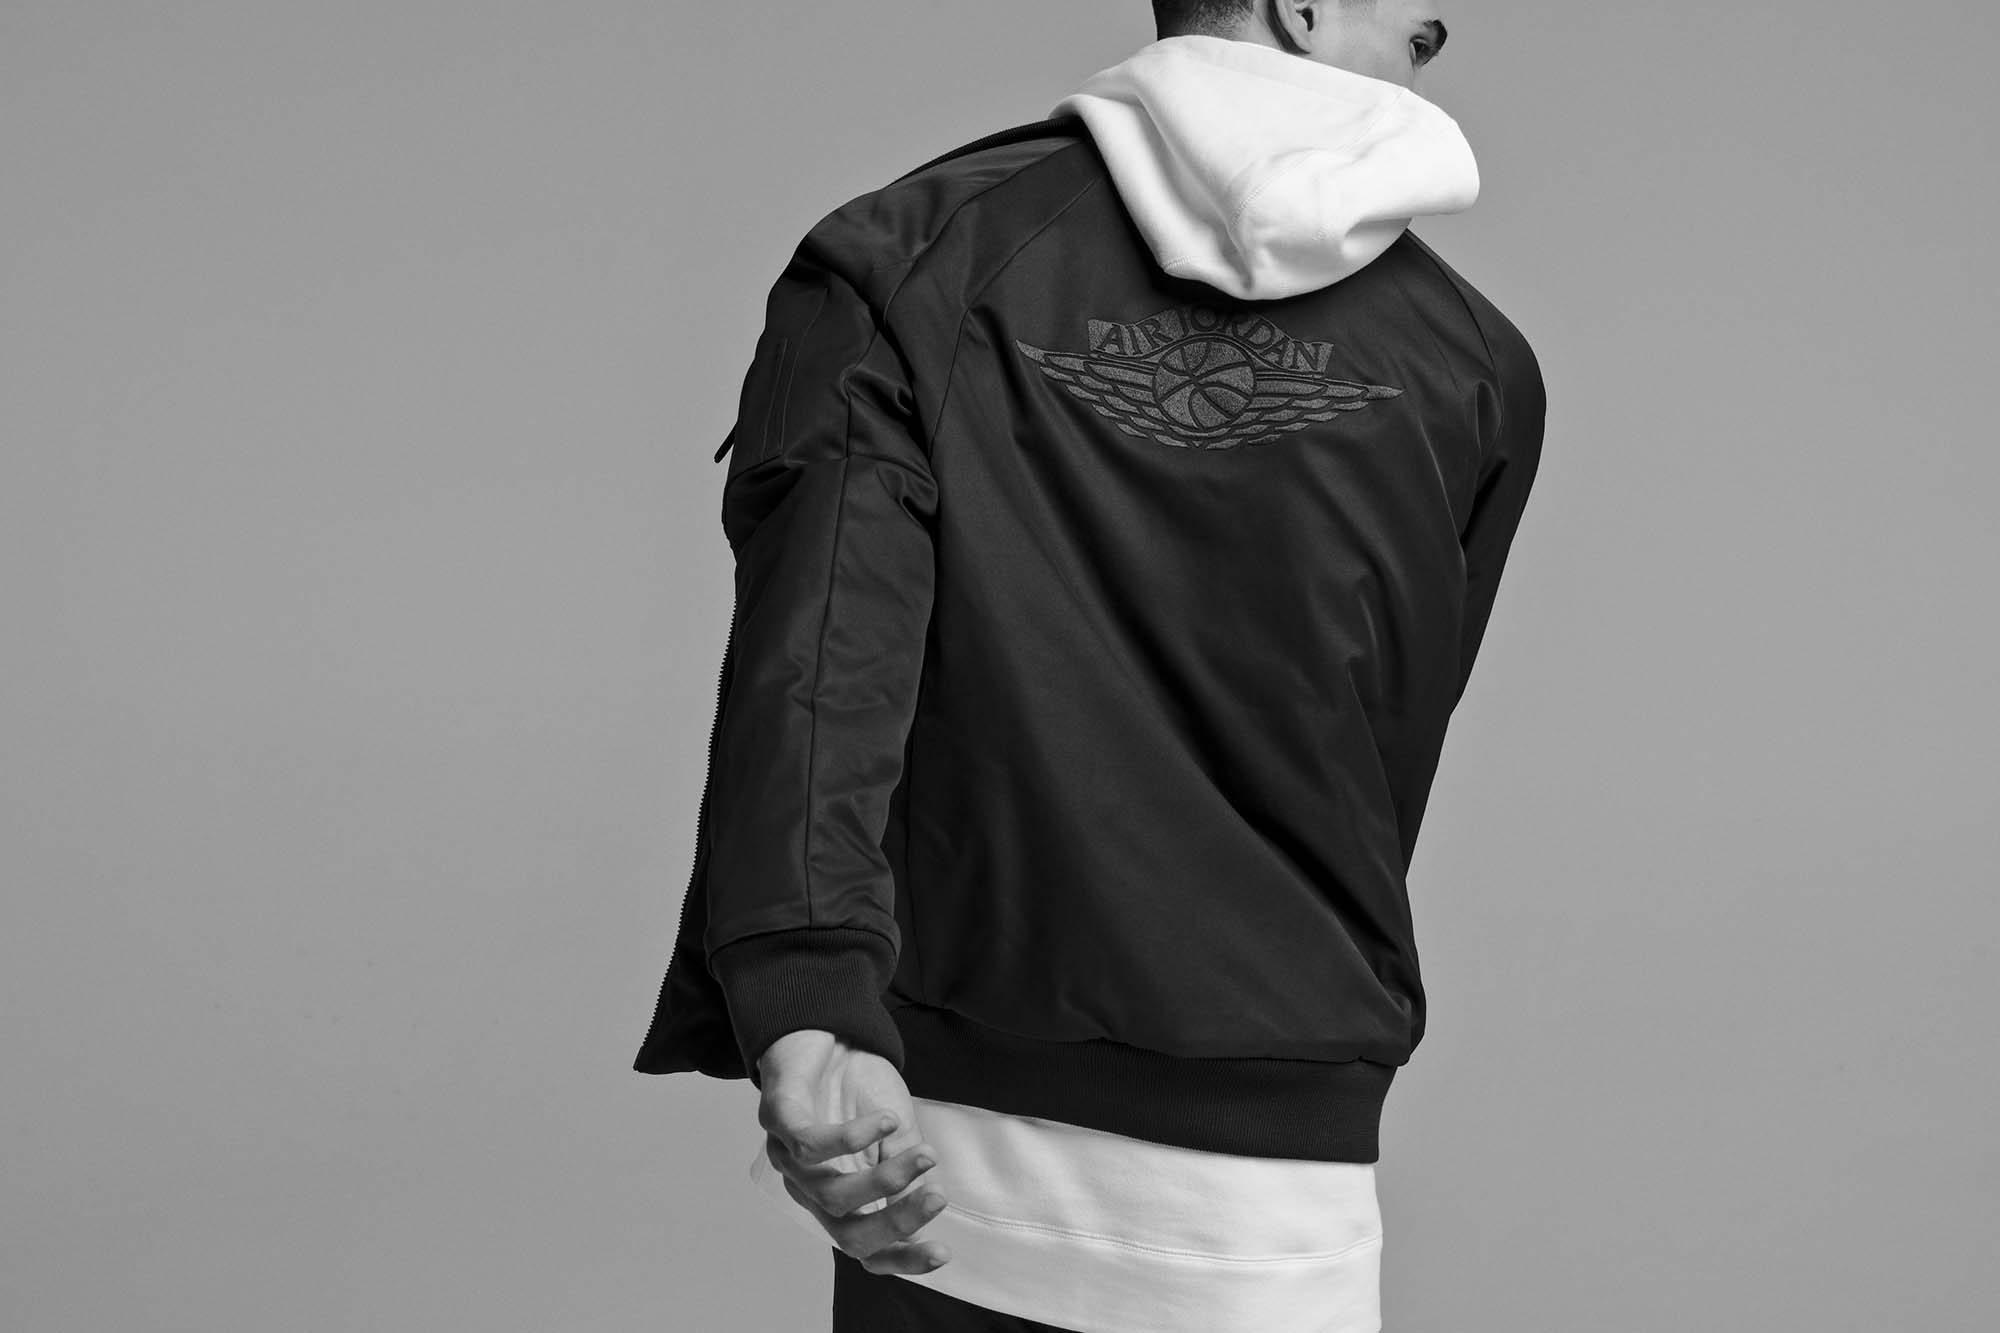 jordan-brand-2017-aw-clothing-collection-007